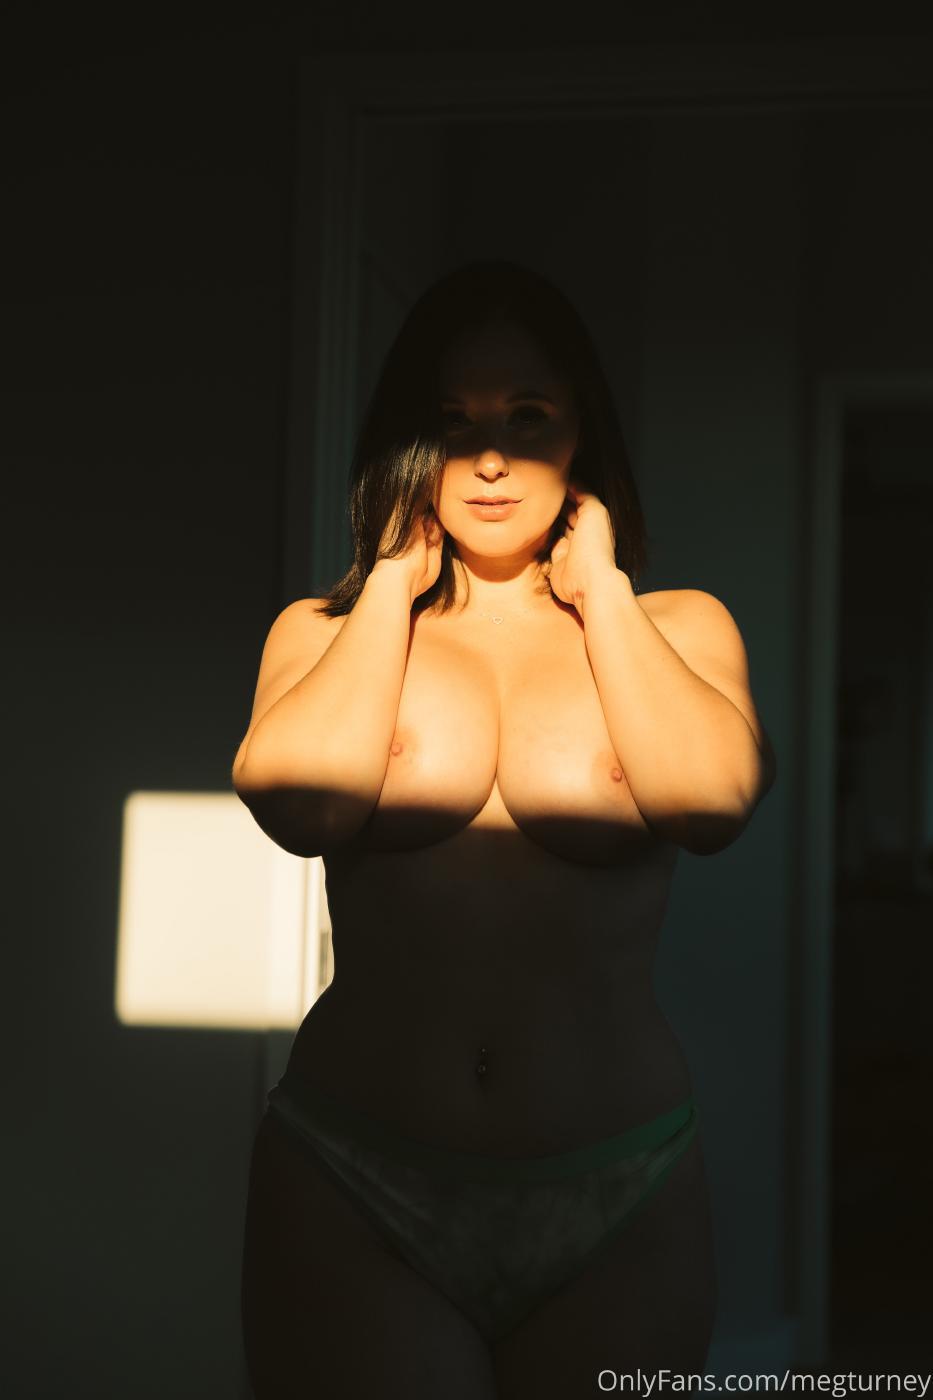 Meg Turney Nude Sunset Onlyfans Set Leaked Gobwrh